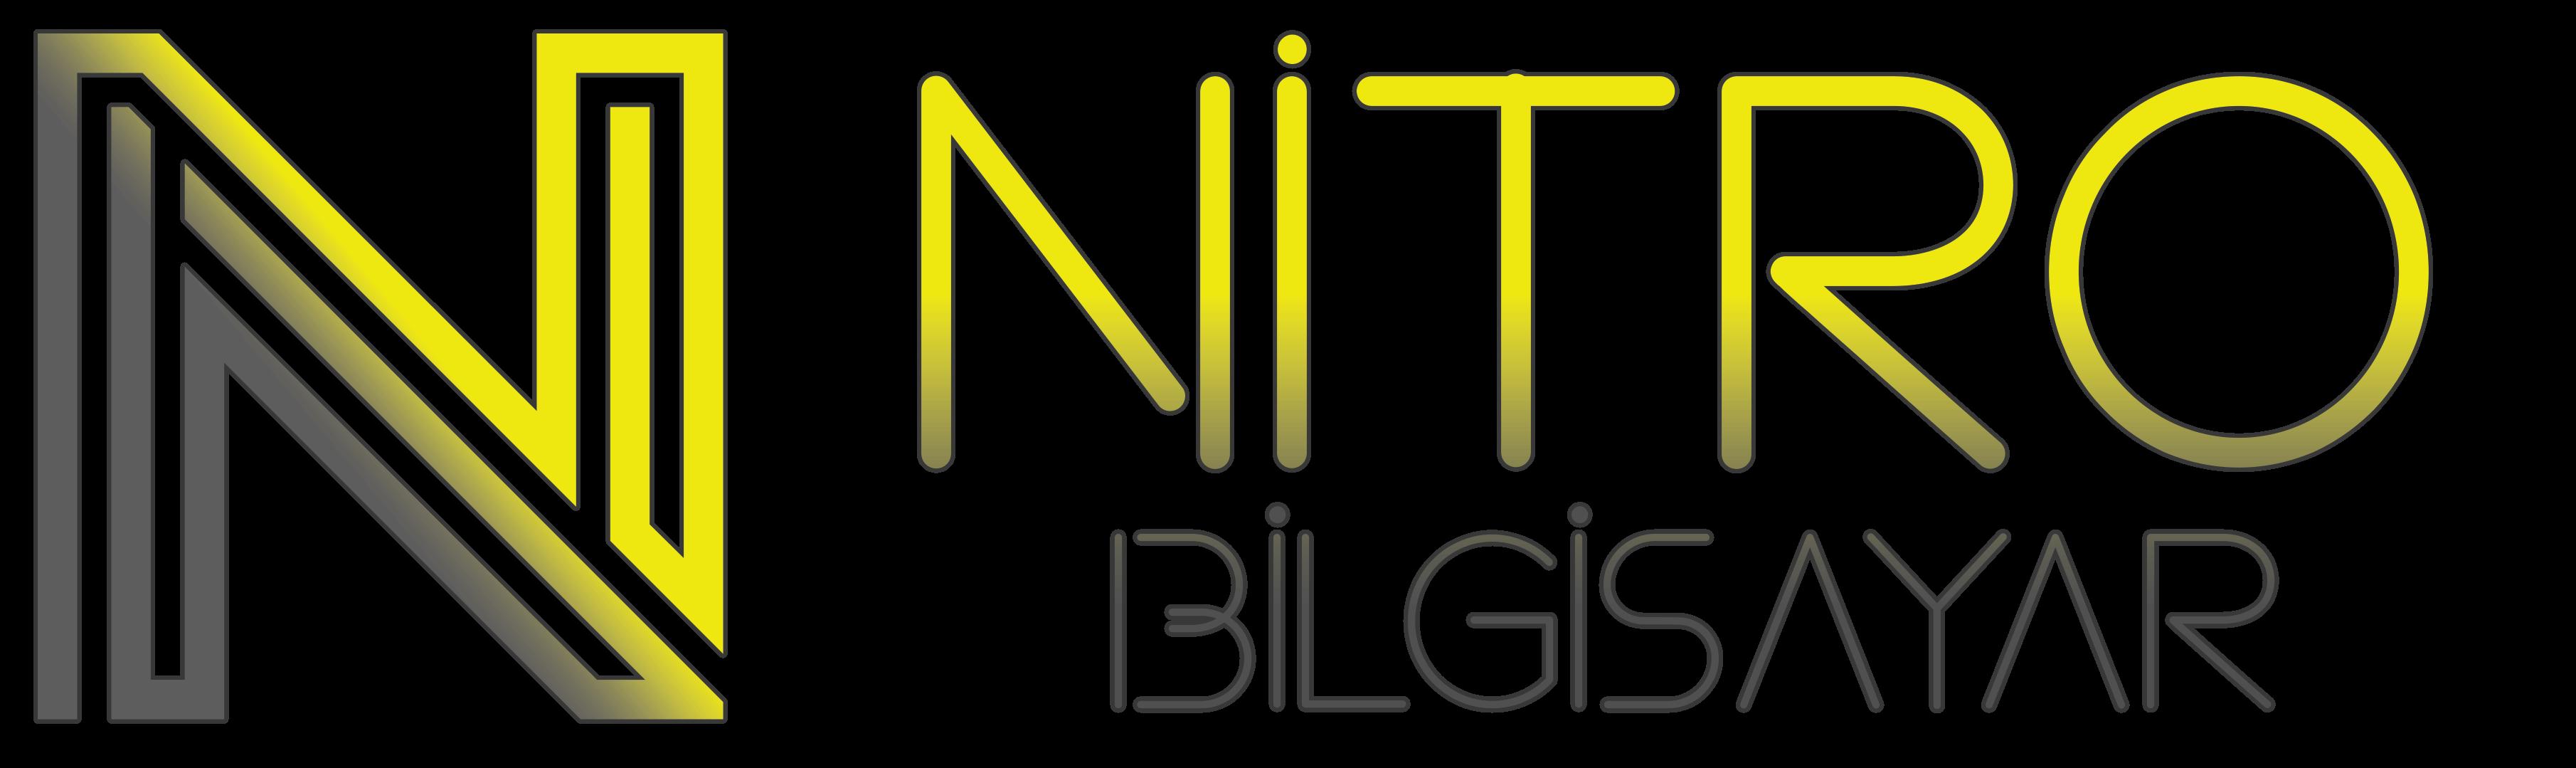 Nitro Bilgisayar Logo2